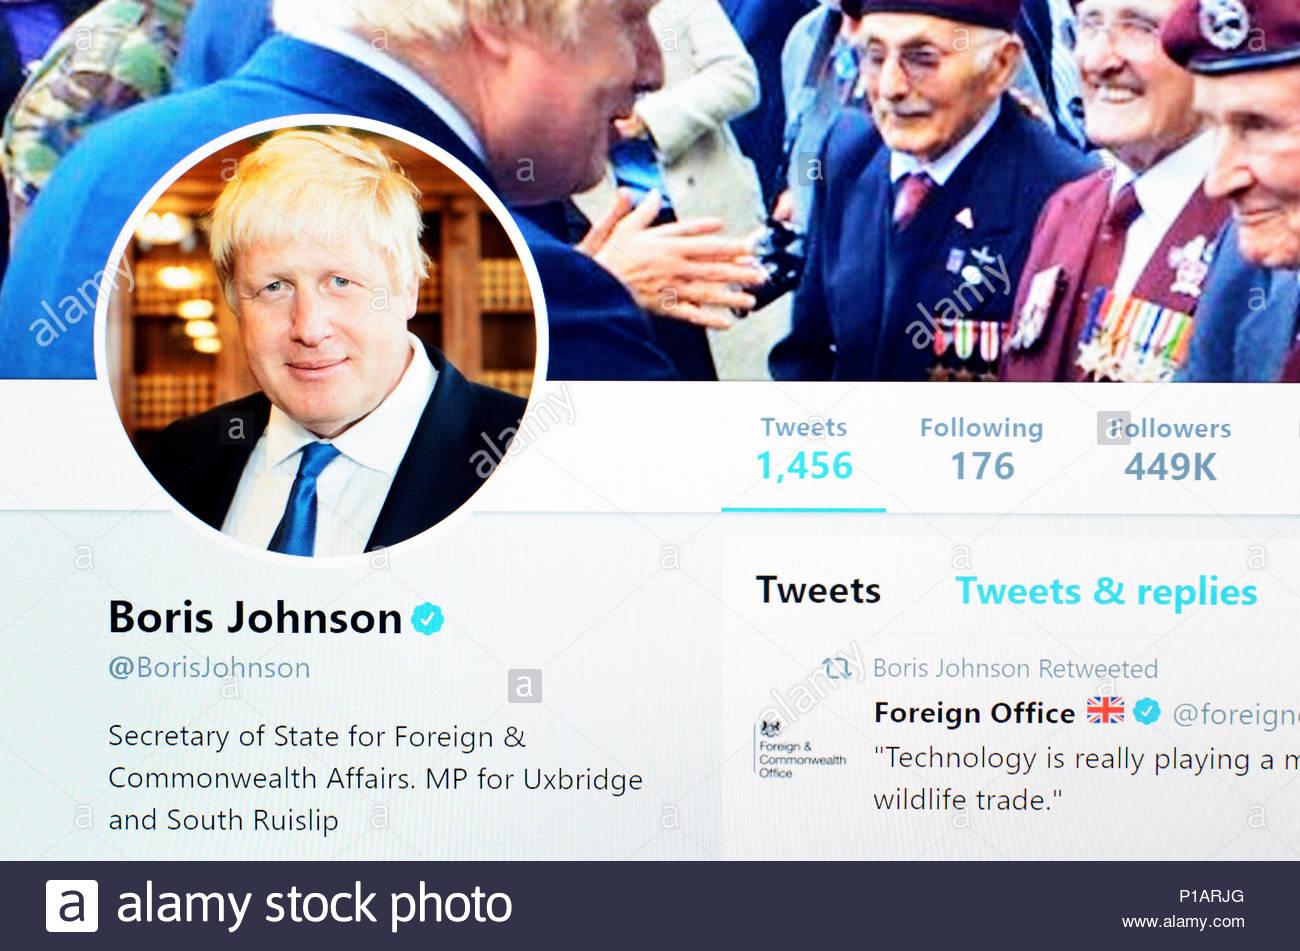 Boris Johnson Twitter account home page (June 2018) - Stock Image